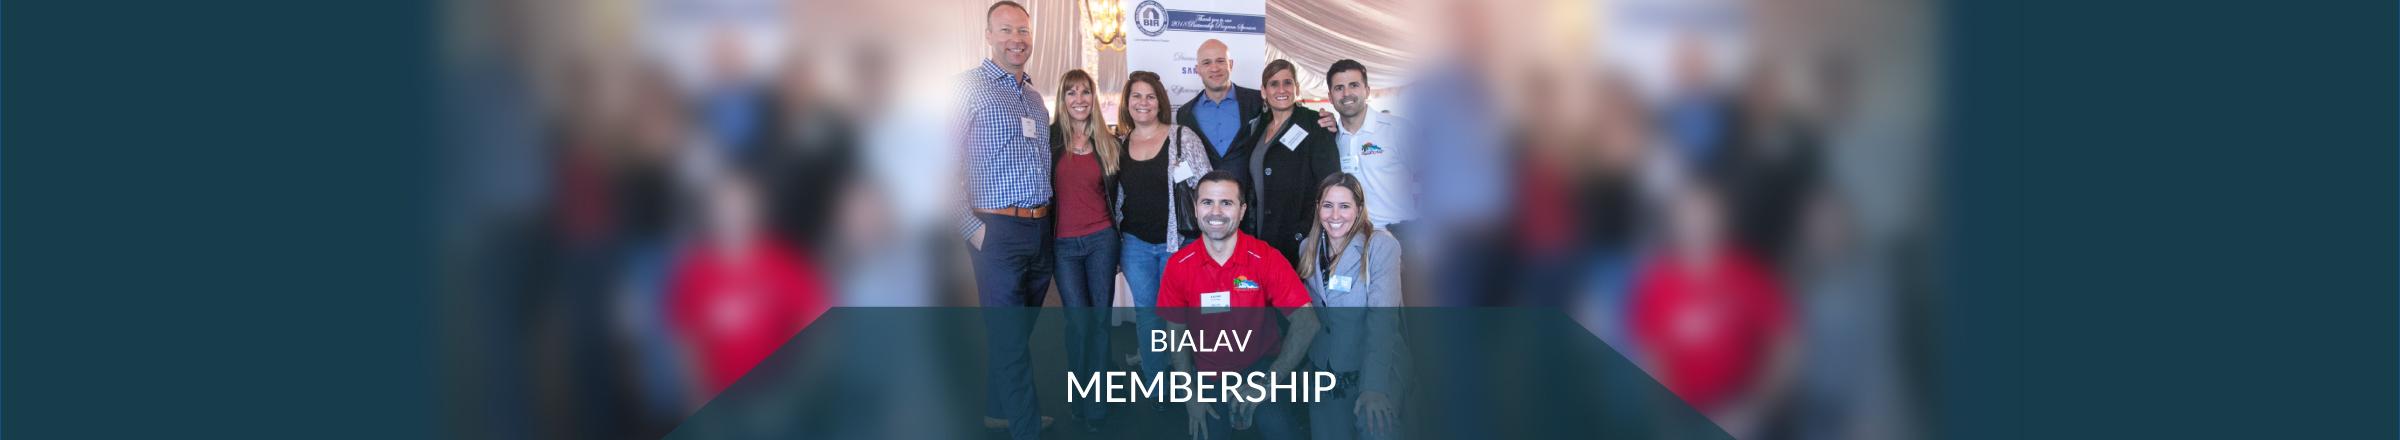 bialav-membership-header-2